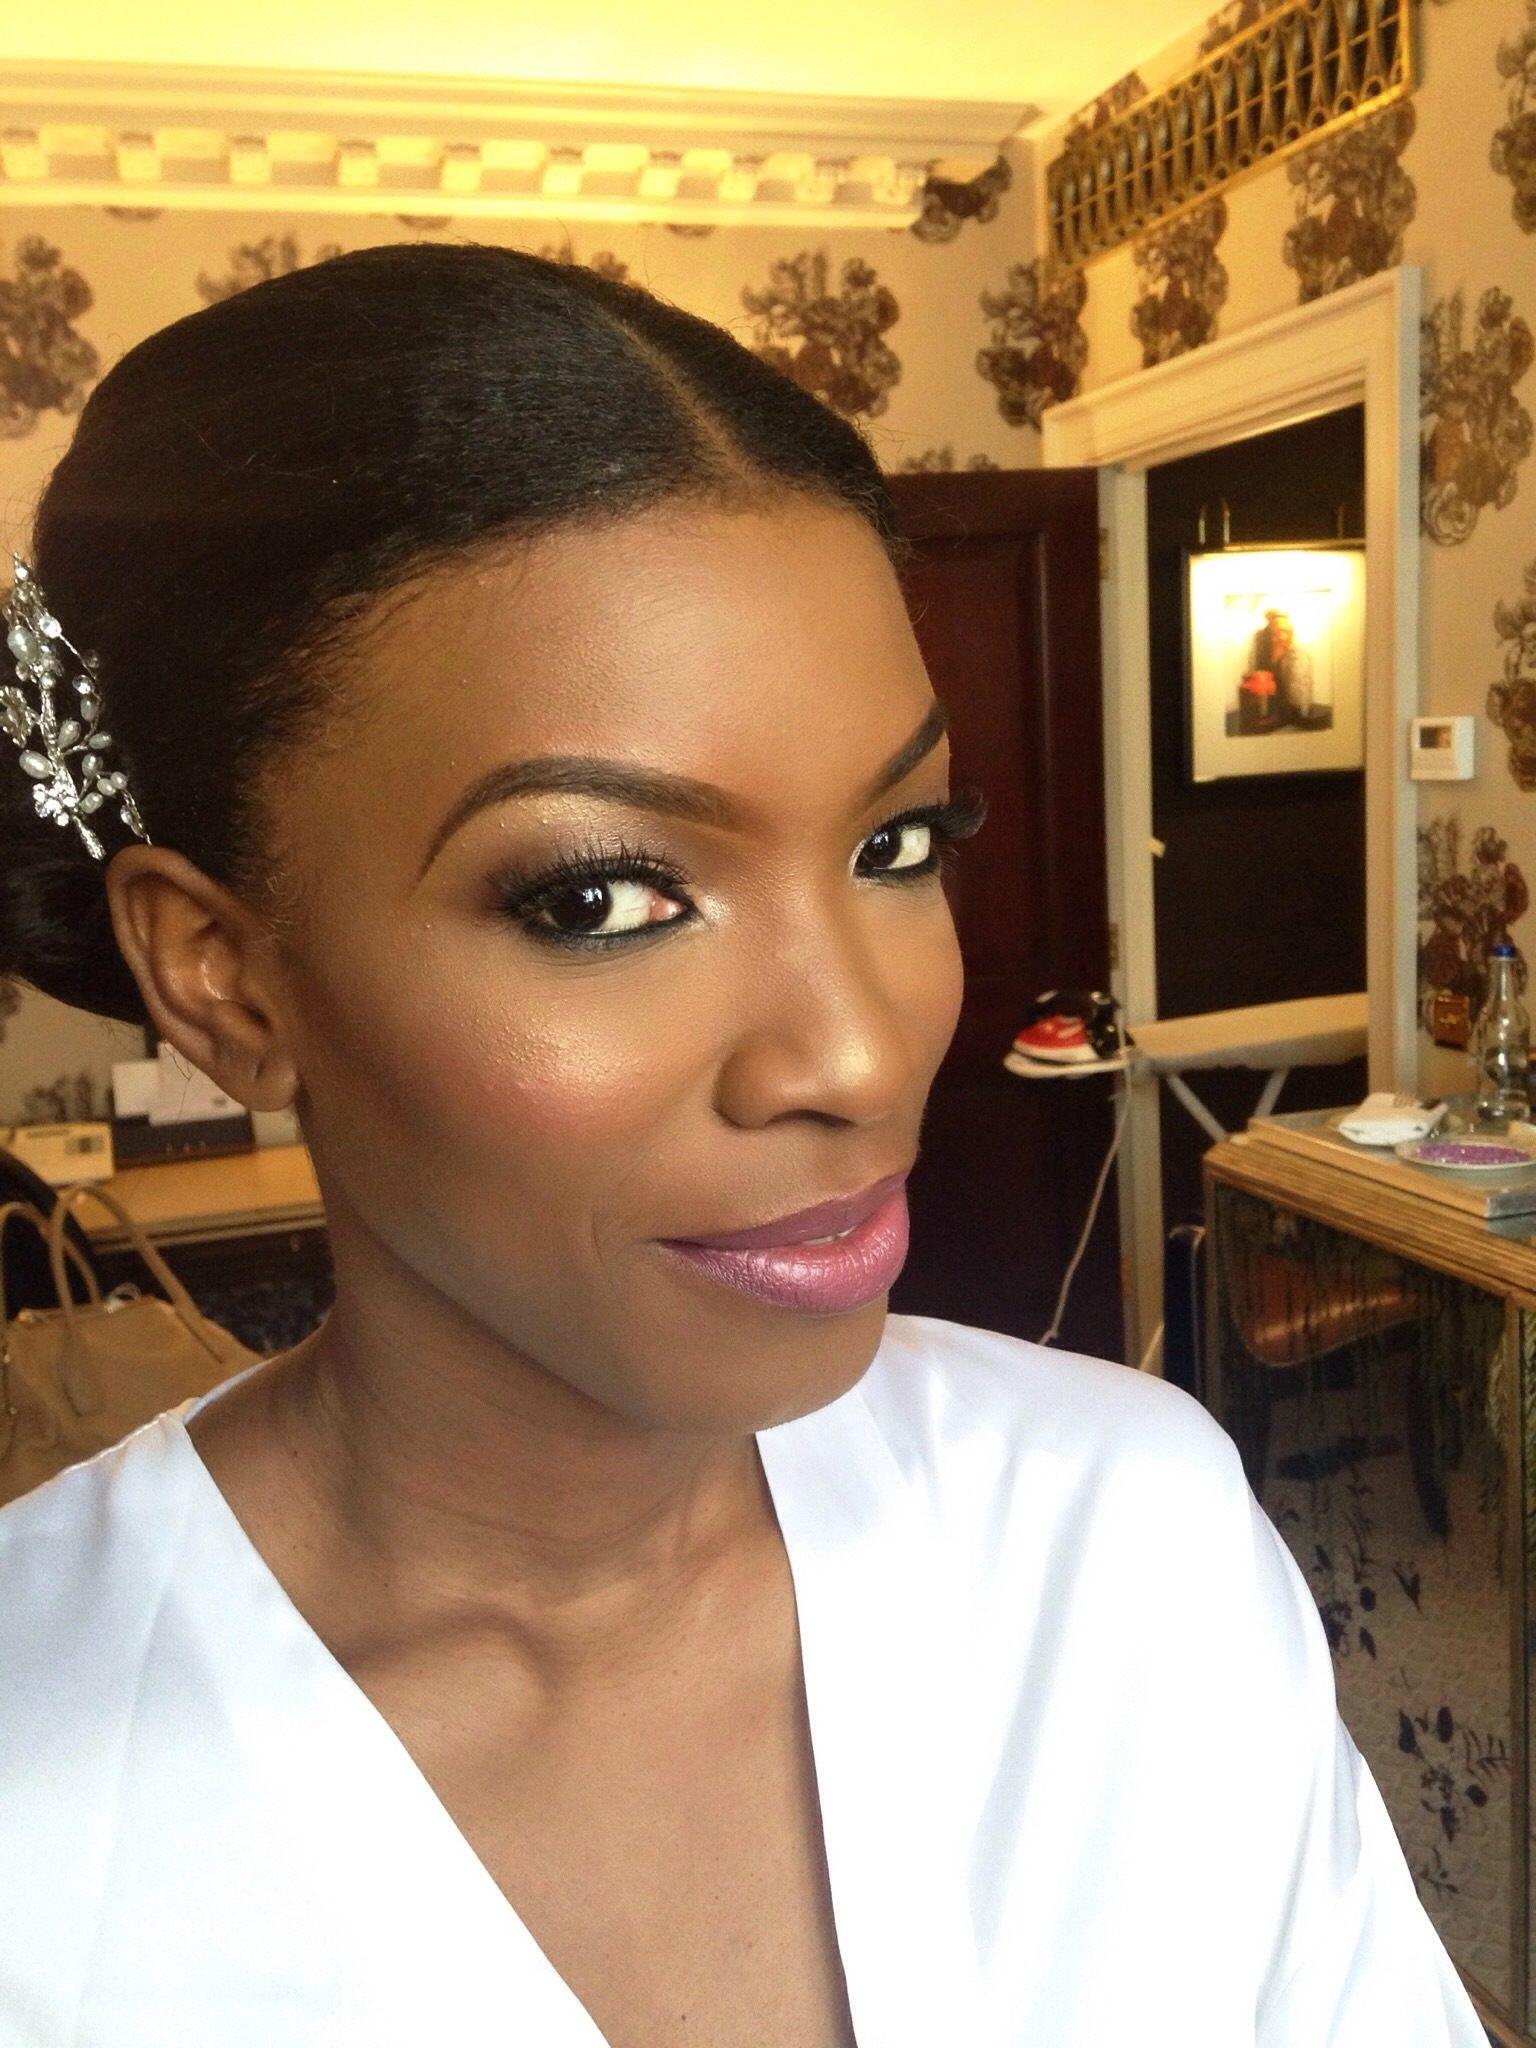 ... ijay 39 s wedding london black makeup artist black makeup artist london black wedding makeup ...